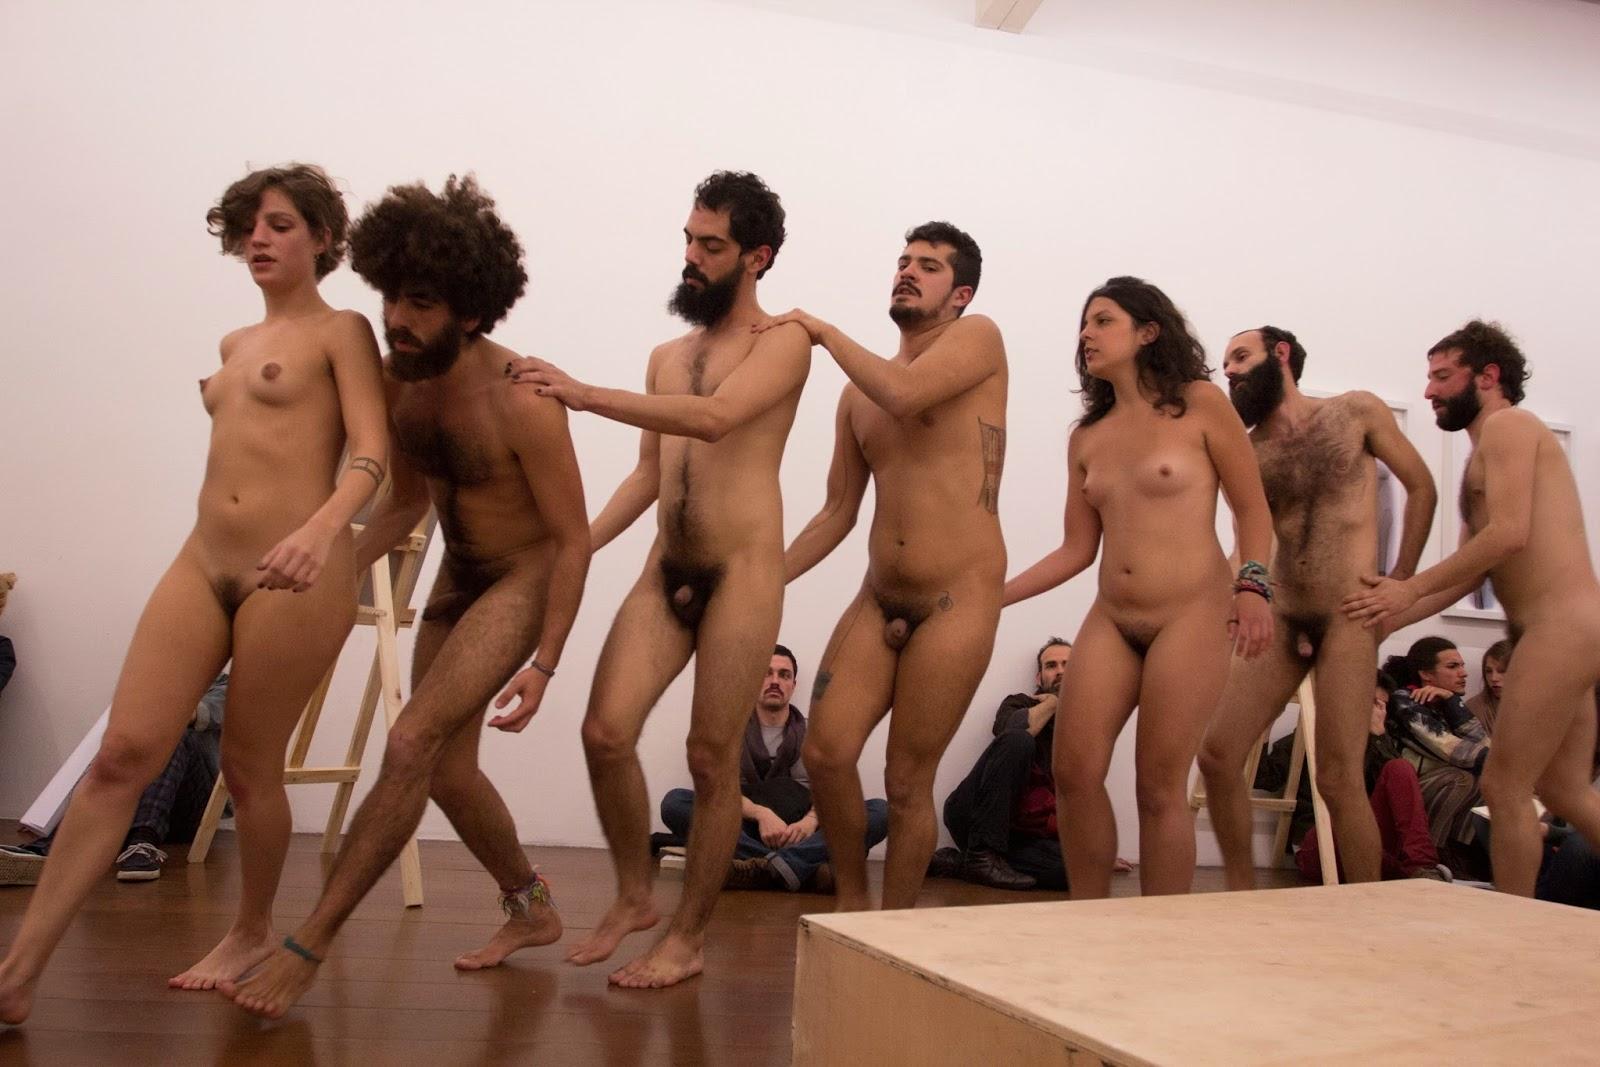 leeza gibbons nude pics